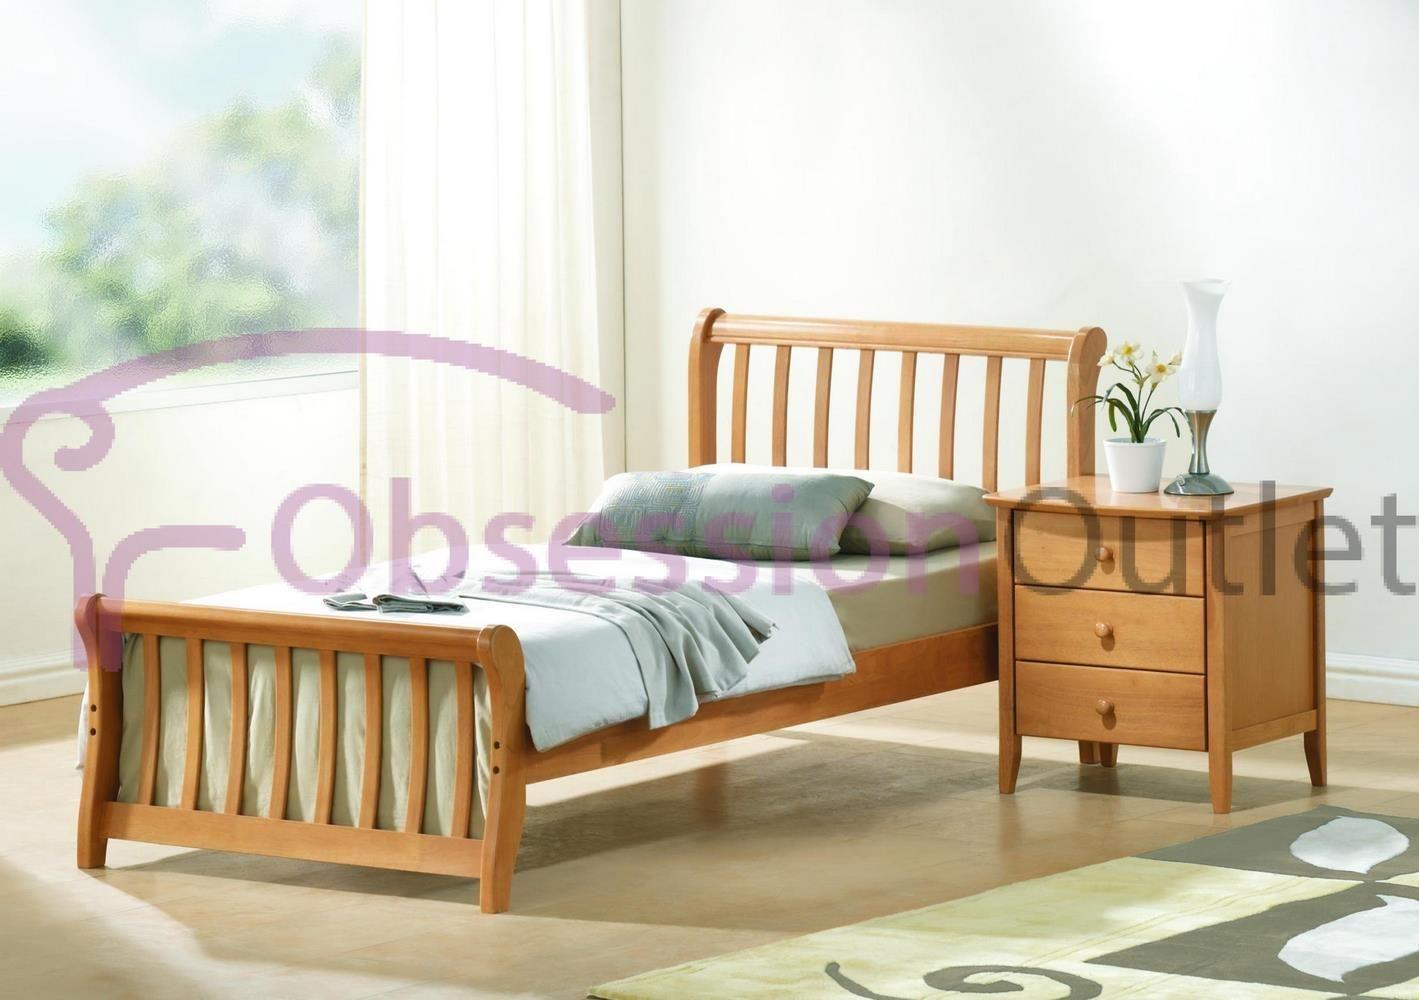 Sku Sb17 Bed Design Wooden Bed Design Wooden Bed